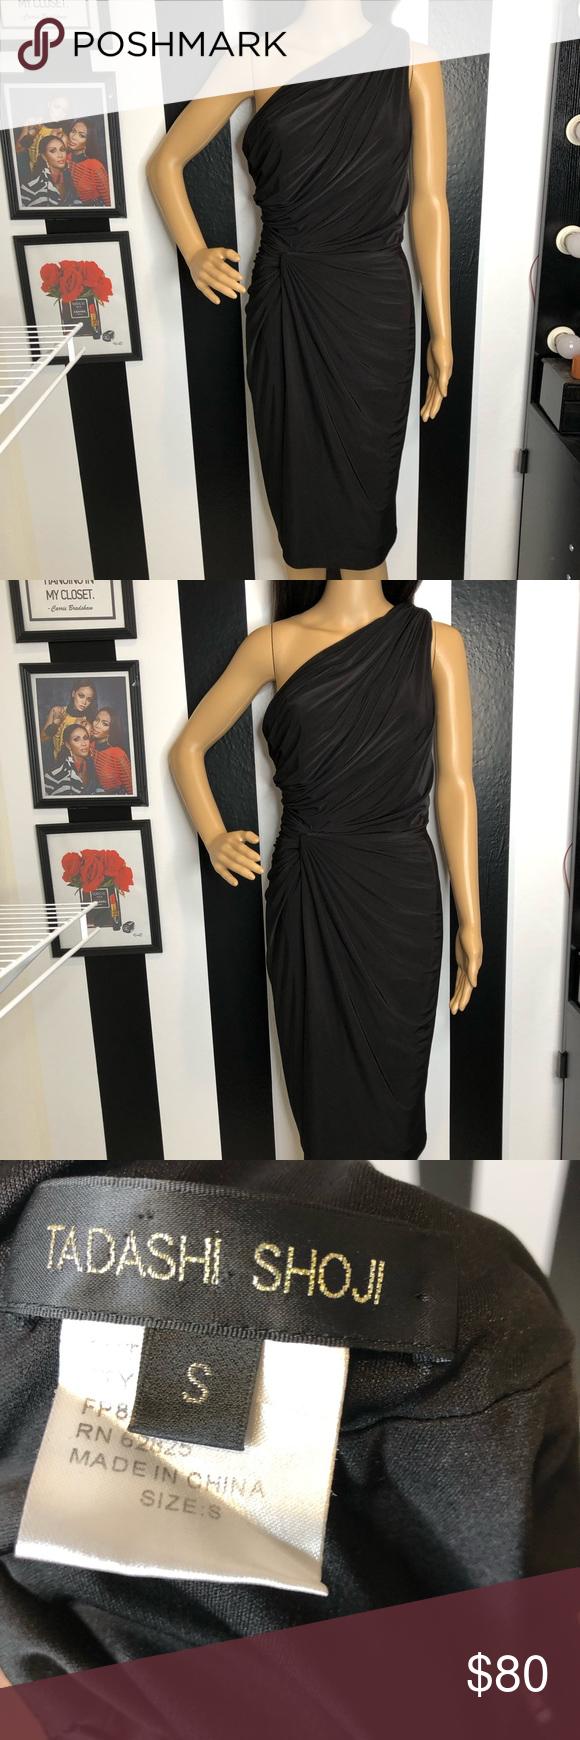 Tadashi Shoji Black One Shoulder Dress Brand Tadashi Shoji Size Color Black Features One Shoulder Twist Black One Shoulder Dress Dress Brands Event Dresses [ 1740 x 580 Pixel ]